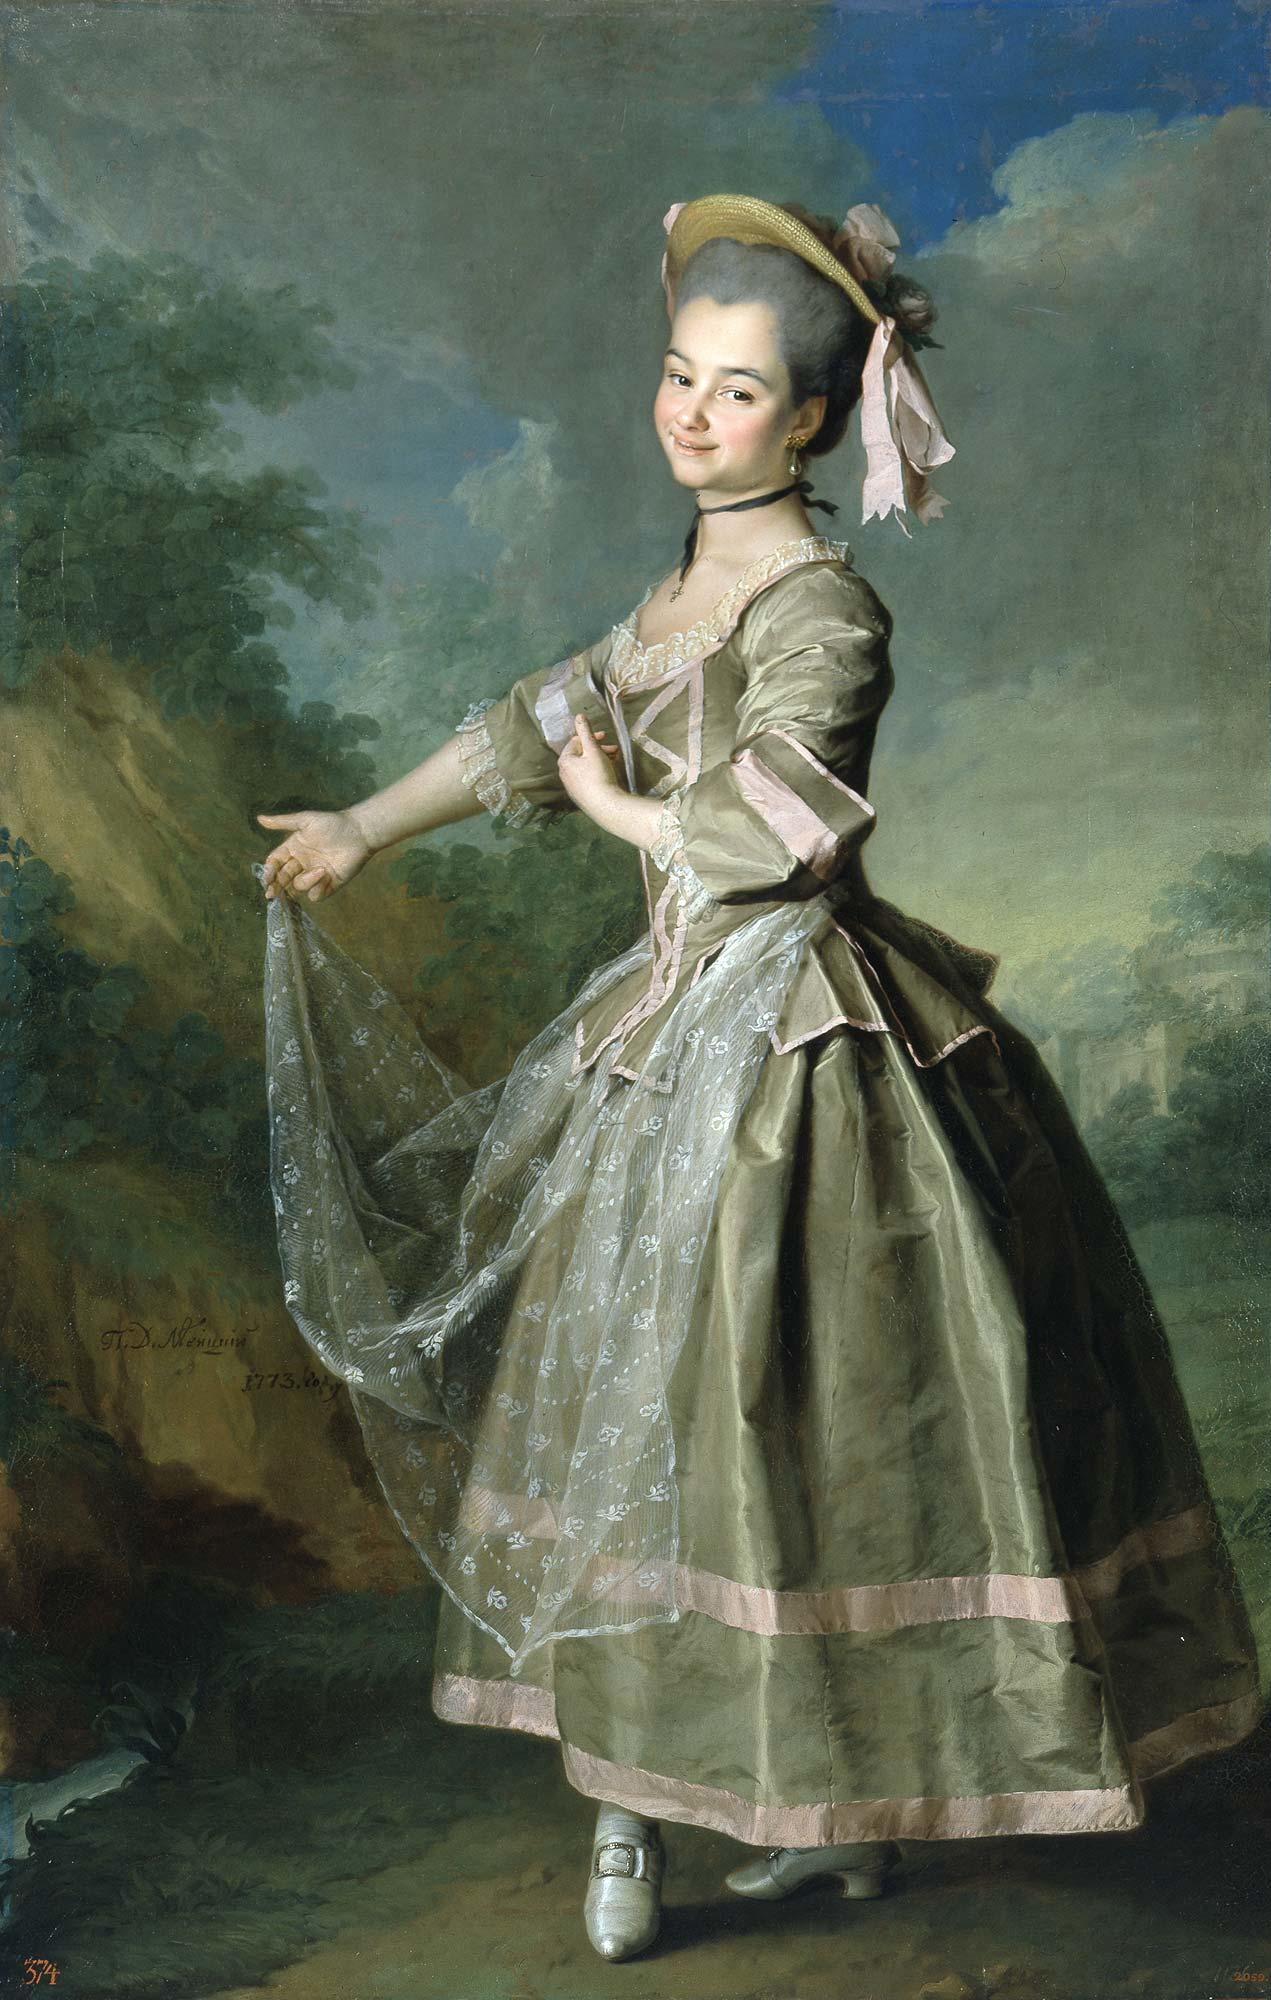 Dmitry Levitsky, Portrait of Ekaterina Nelidova, 1773, Russian museum, St. Petersburg, Russia.